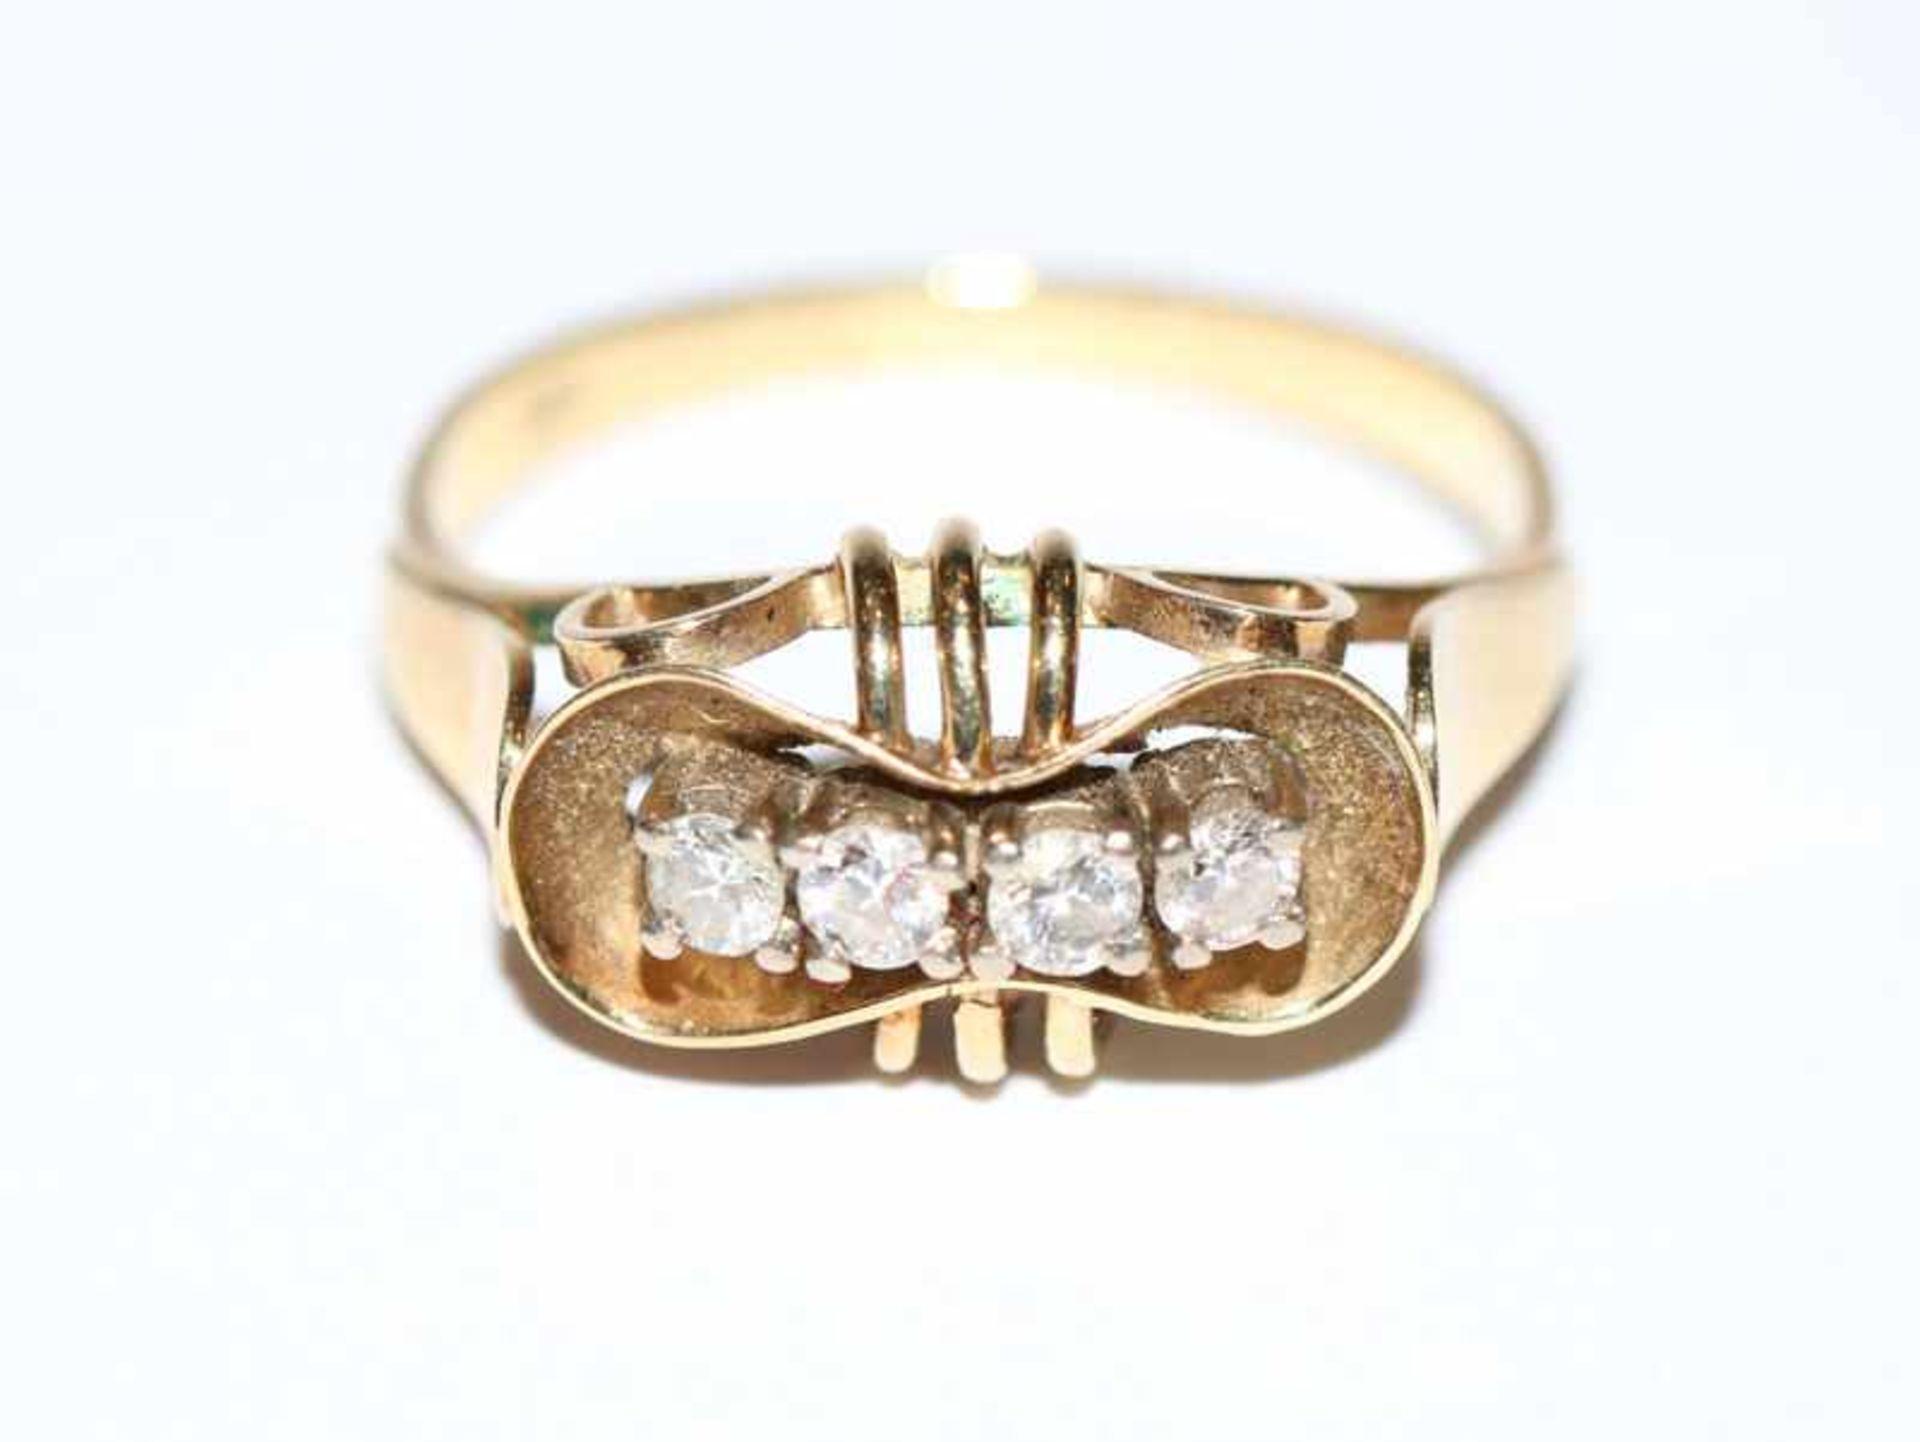 Los 4 - 14 k Gelbgold Ring mit 4 Diamanten, ältere Handarbeit, Gr. 62, 4,2 gr.